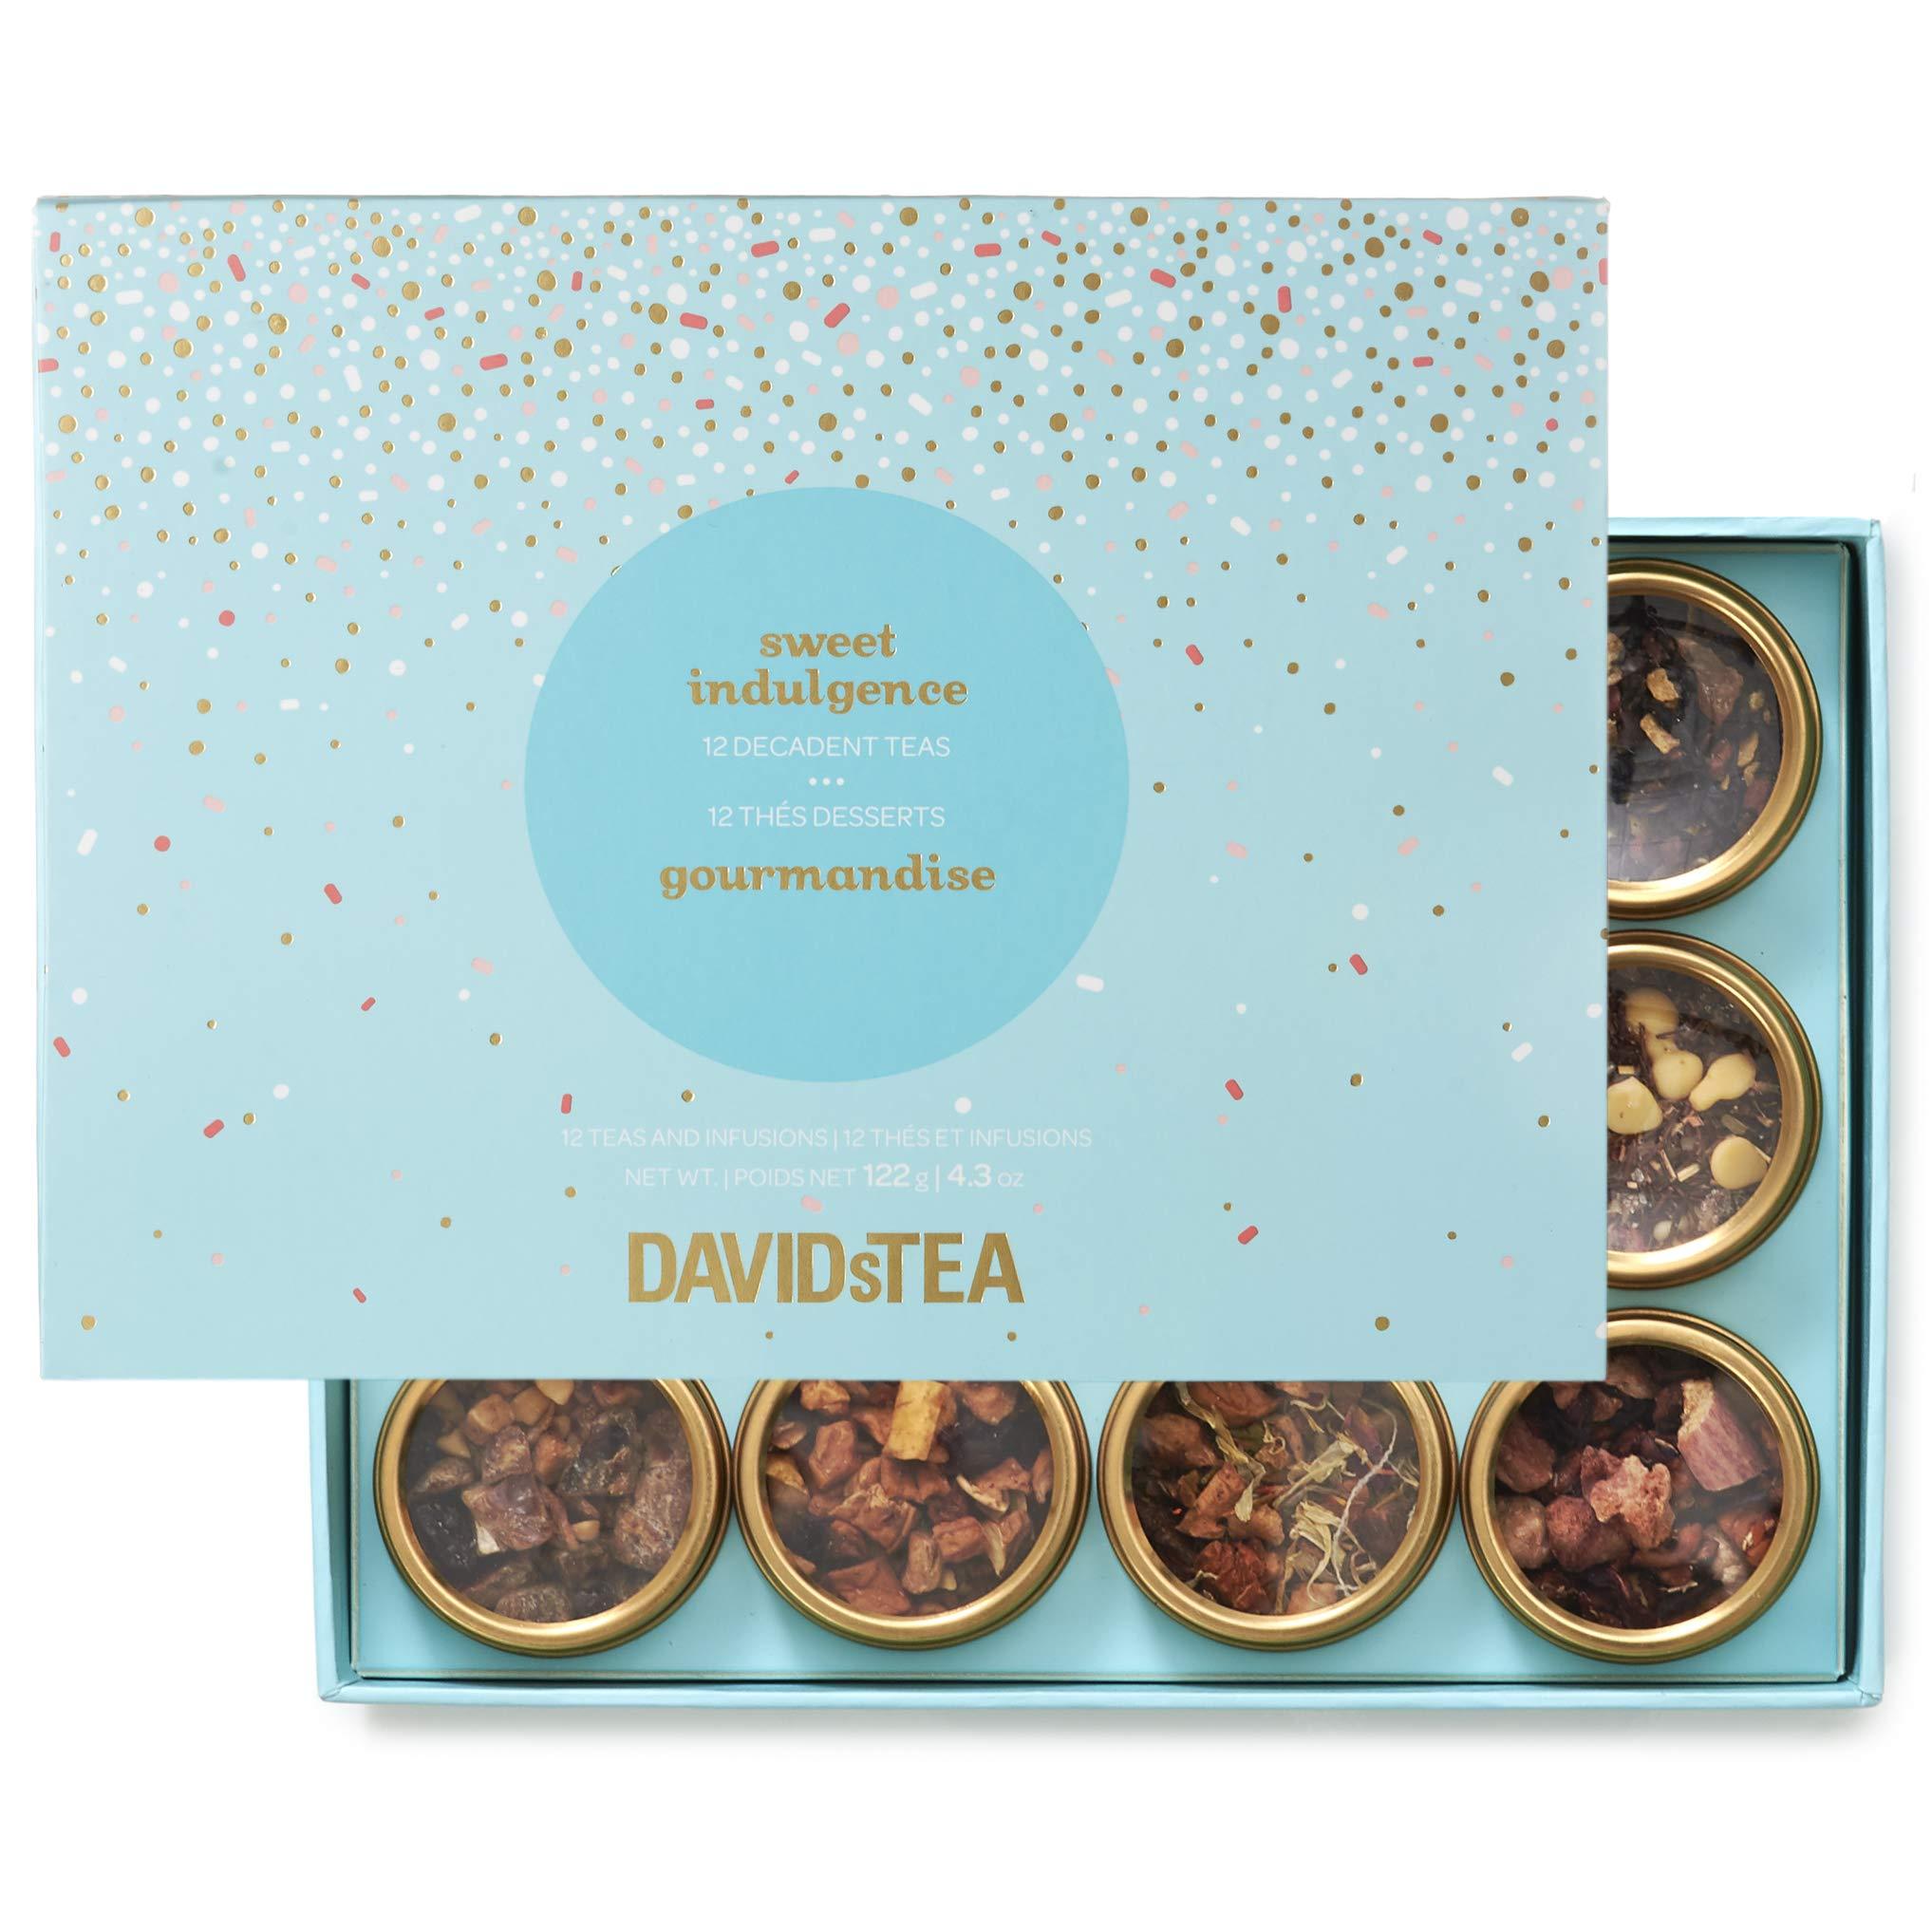 DAVIDsTEA Sweet Indulgence Tea Sampler, Dessert Loose Leaf Tea Gift Set, Assortment of 12 Decadent Teas, 122 g / 4.3 oz (SP) by DAVIDsTEA